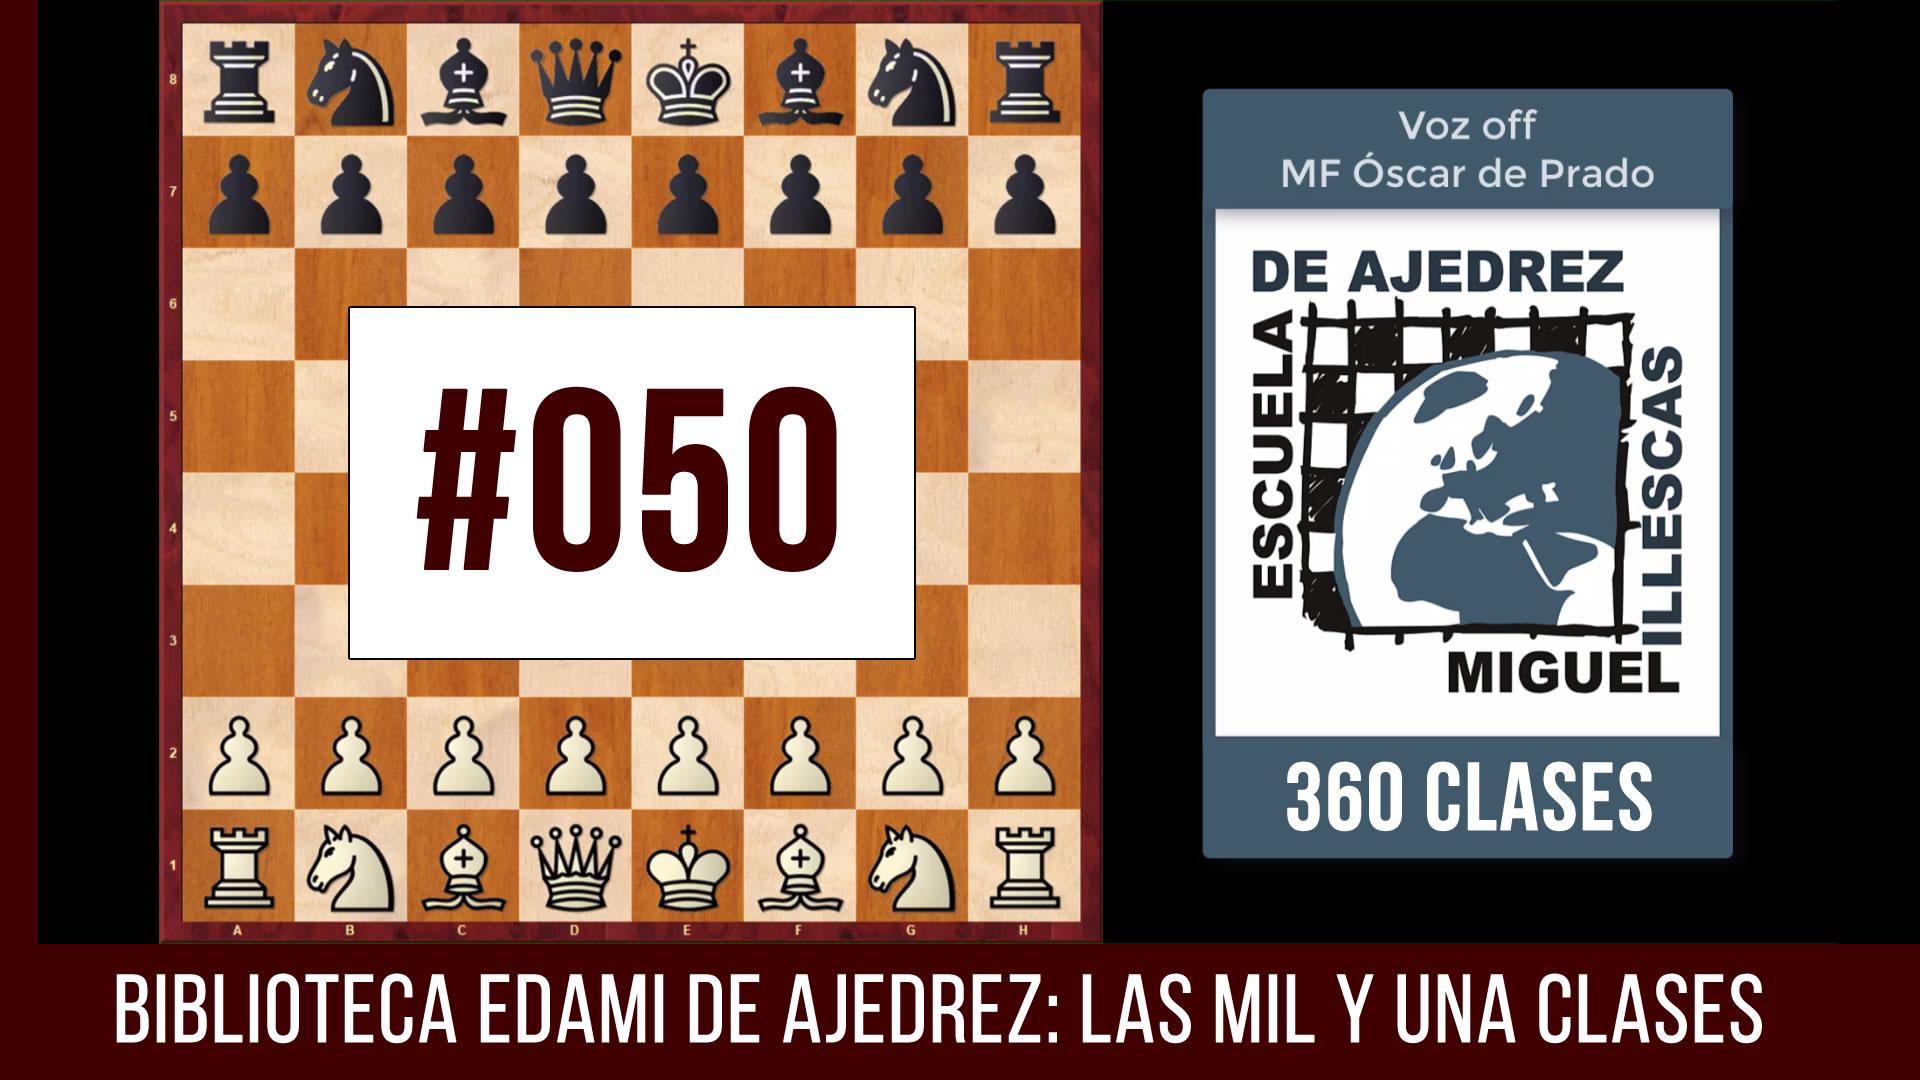 Clases de ajedrez #050 - EDAMI